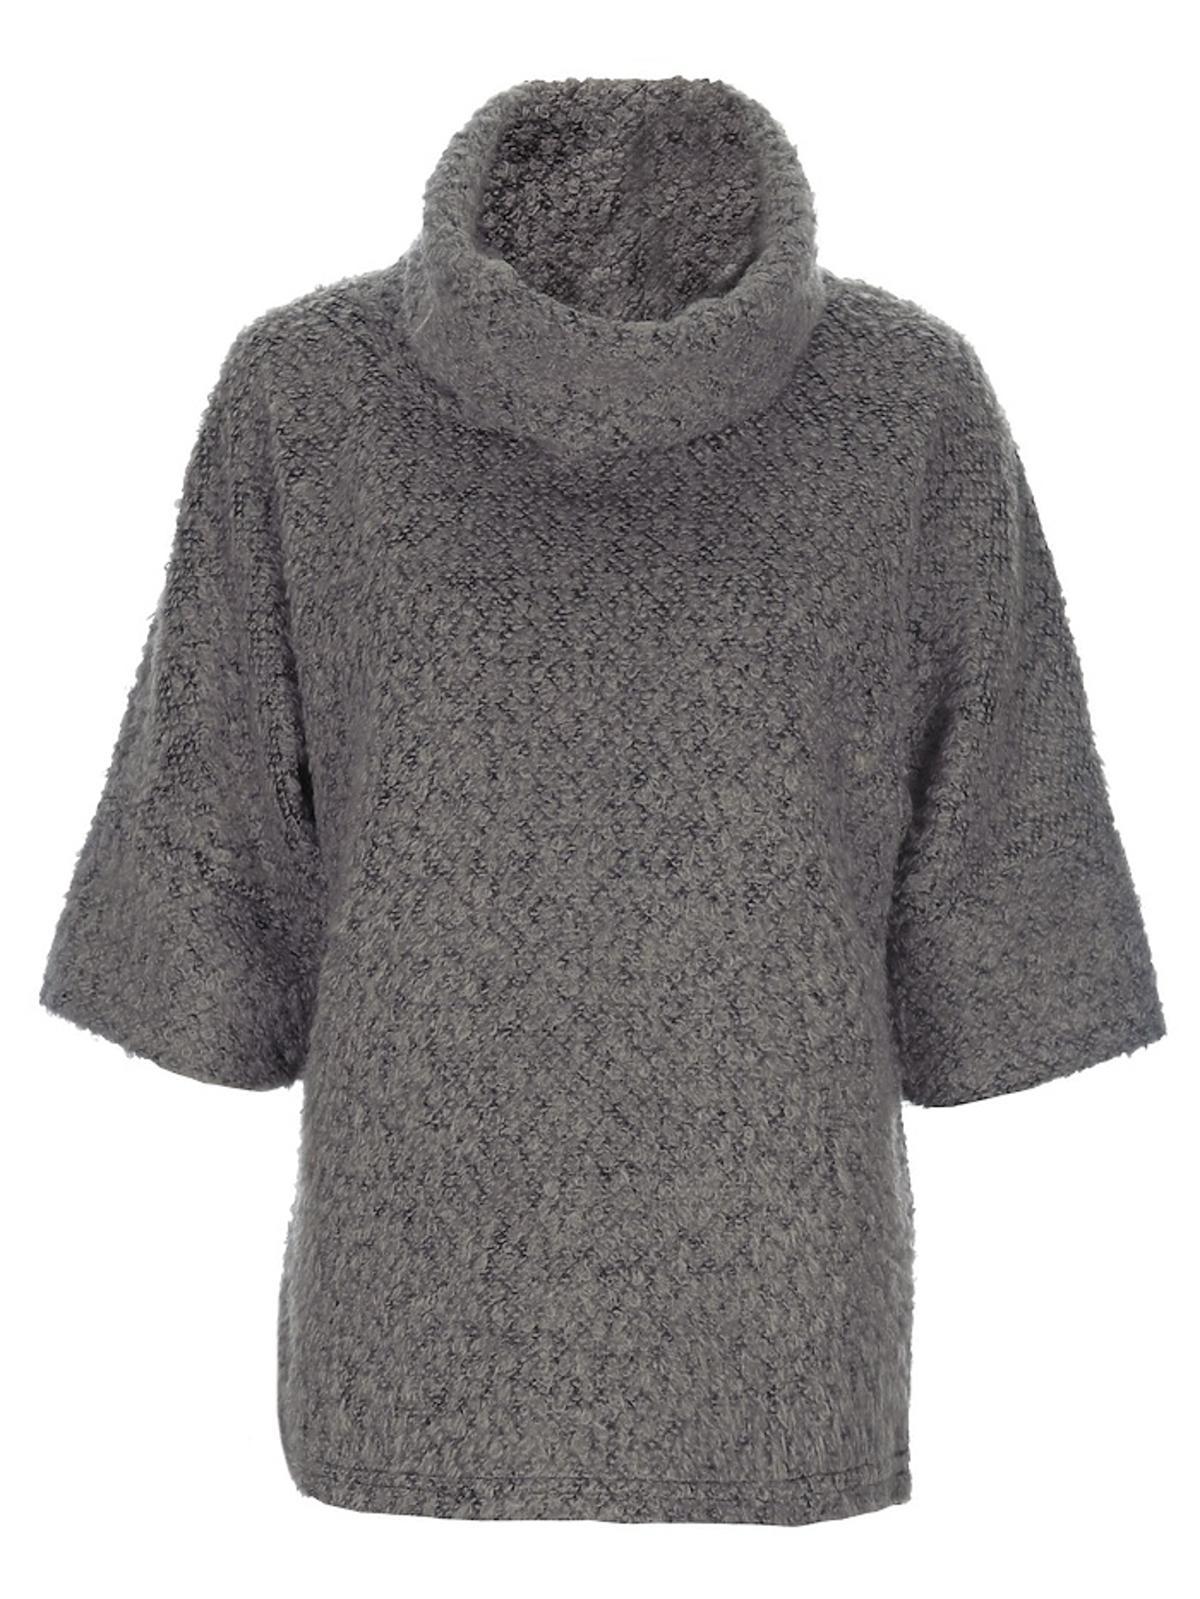 Sweter Top Secret, 89,99 zł